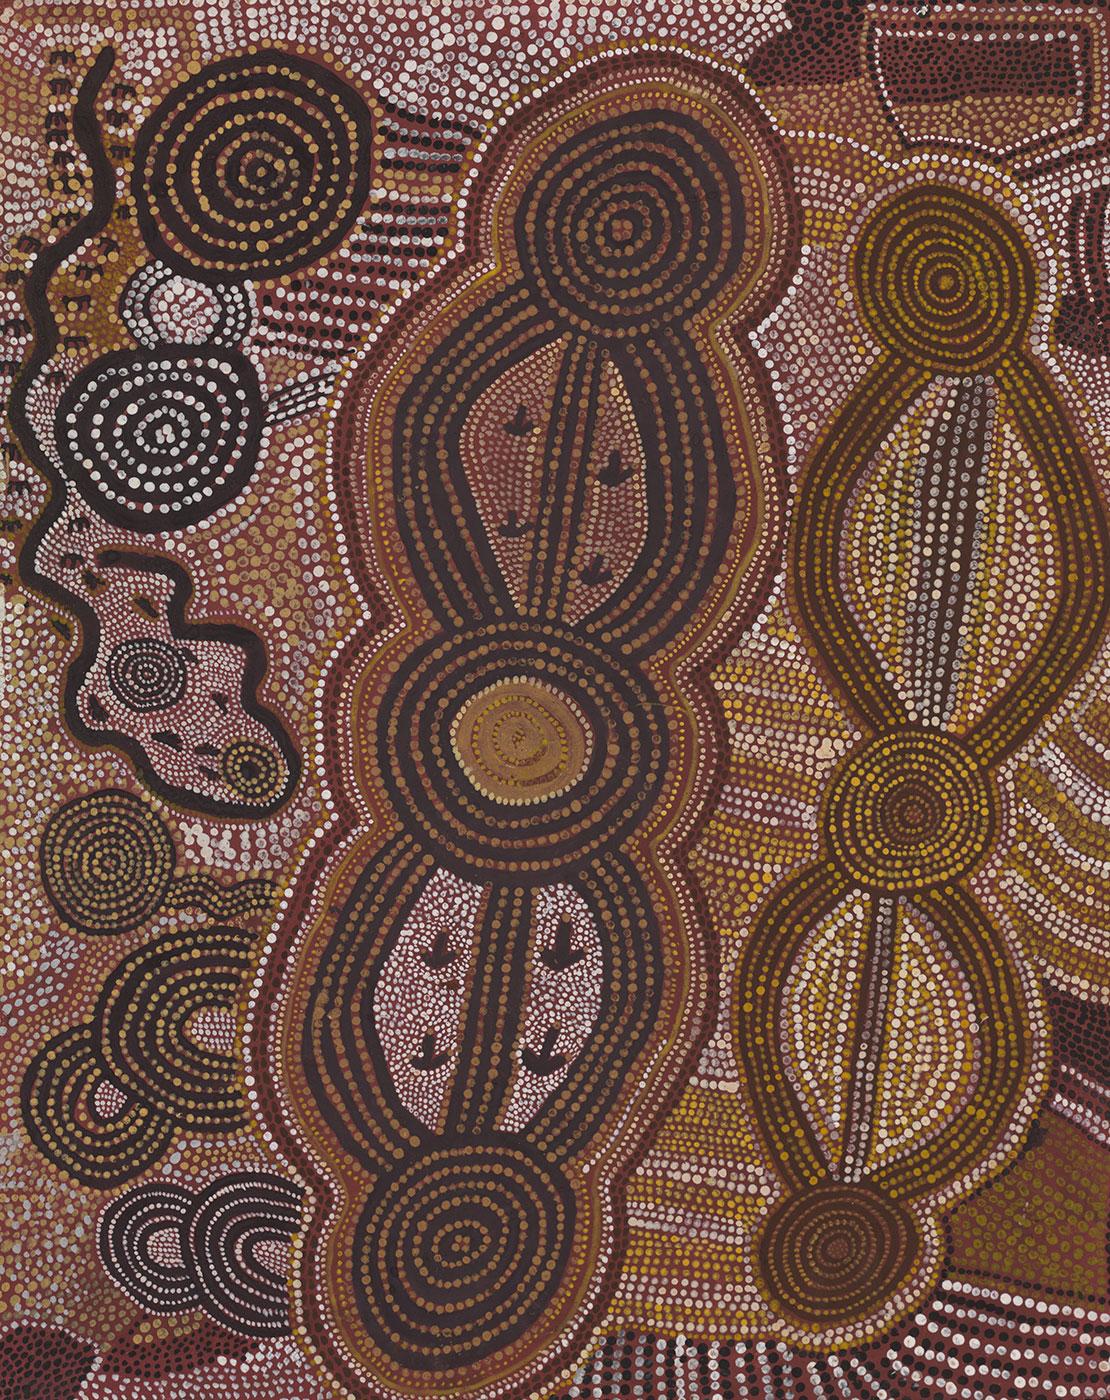 Wanatjalnga 1974 by Charlie Tjaruru (Tarawa) Tjungurrayi. - click to view larger image